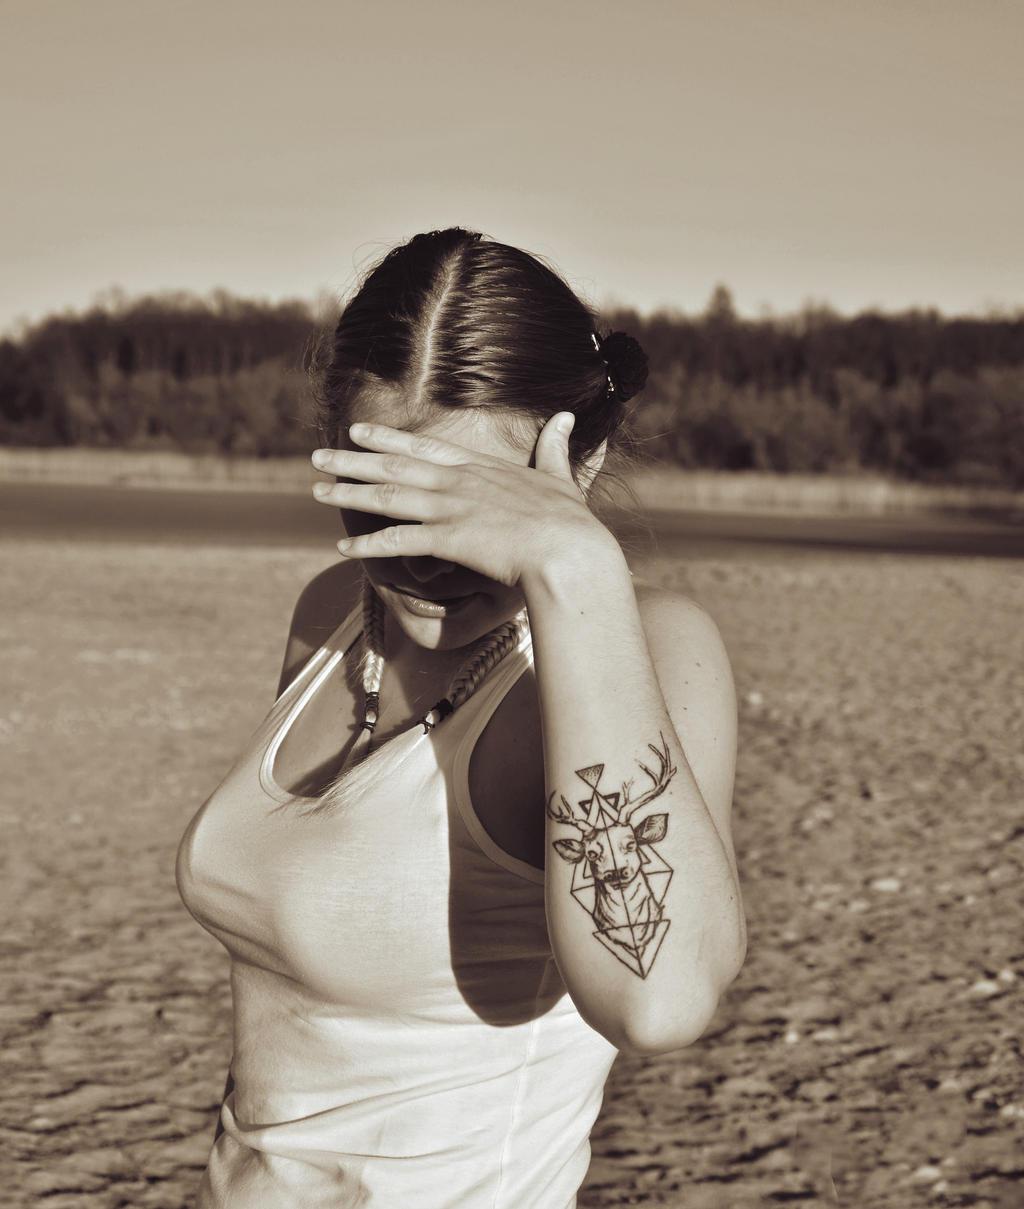 Foto by Lucikaaa